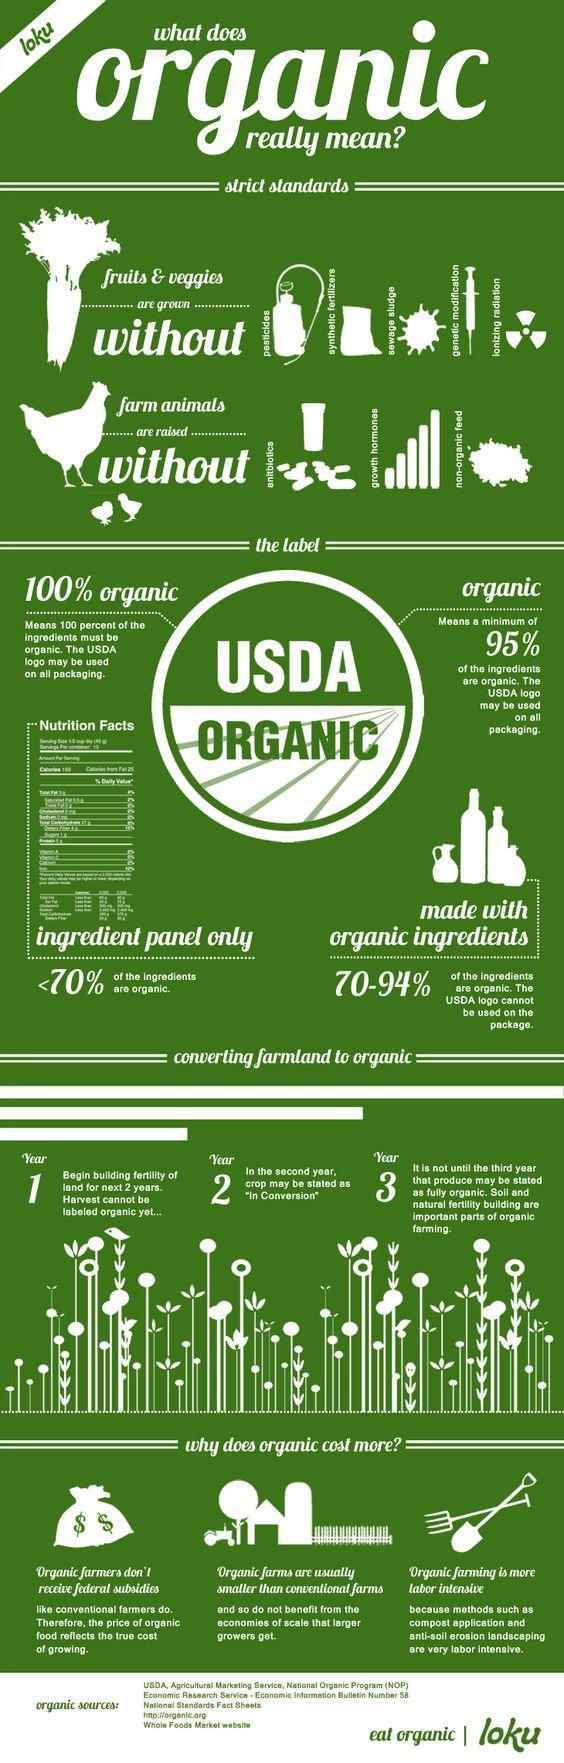 Organic Is!